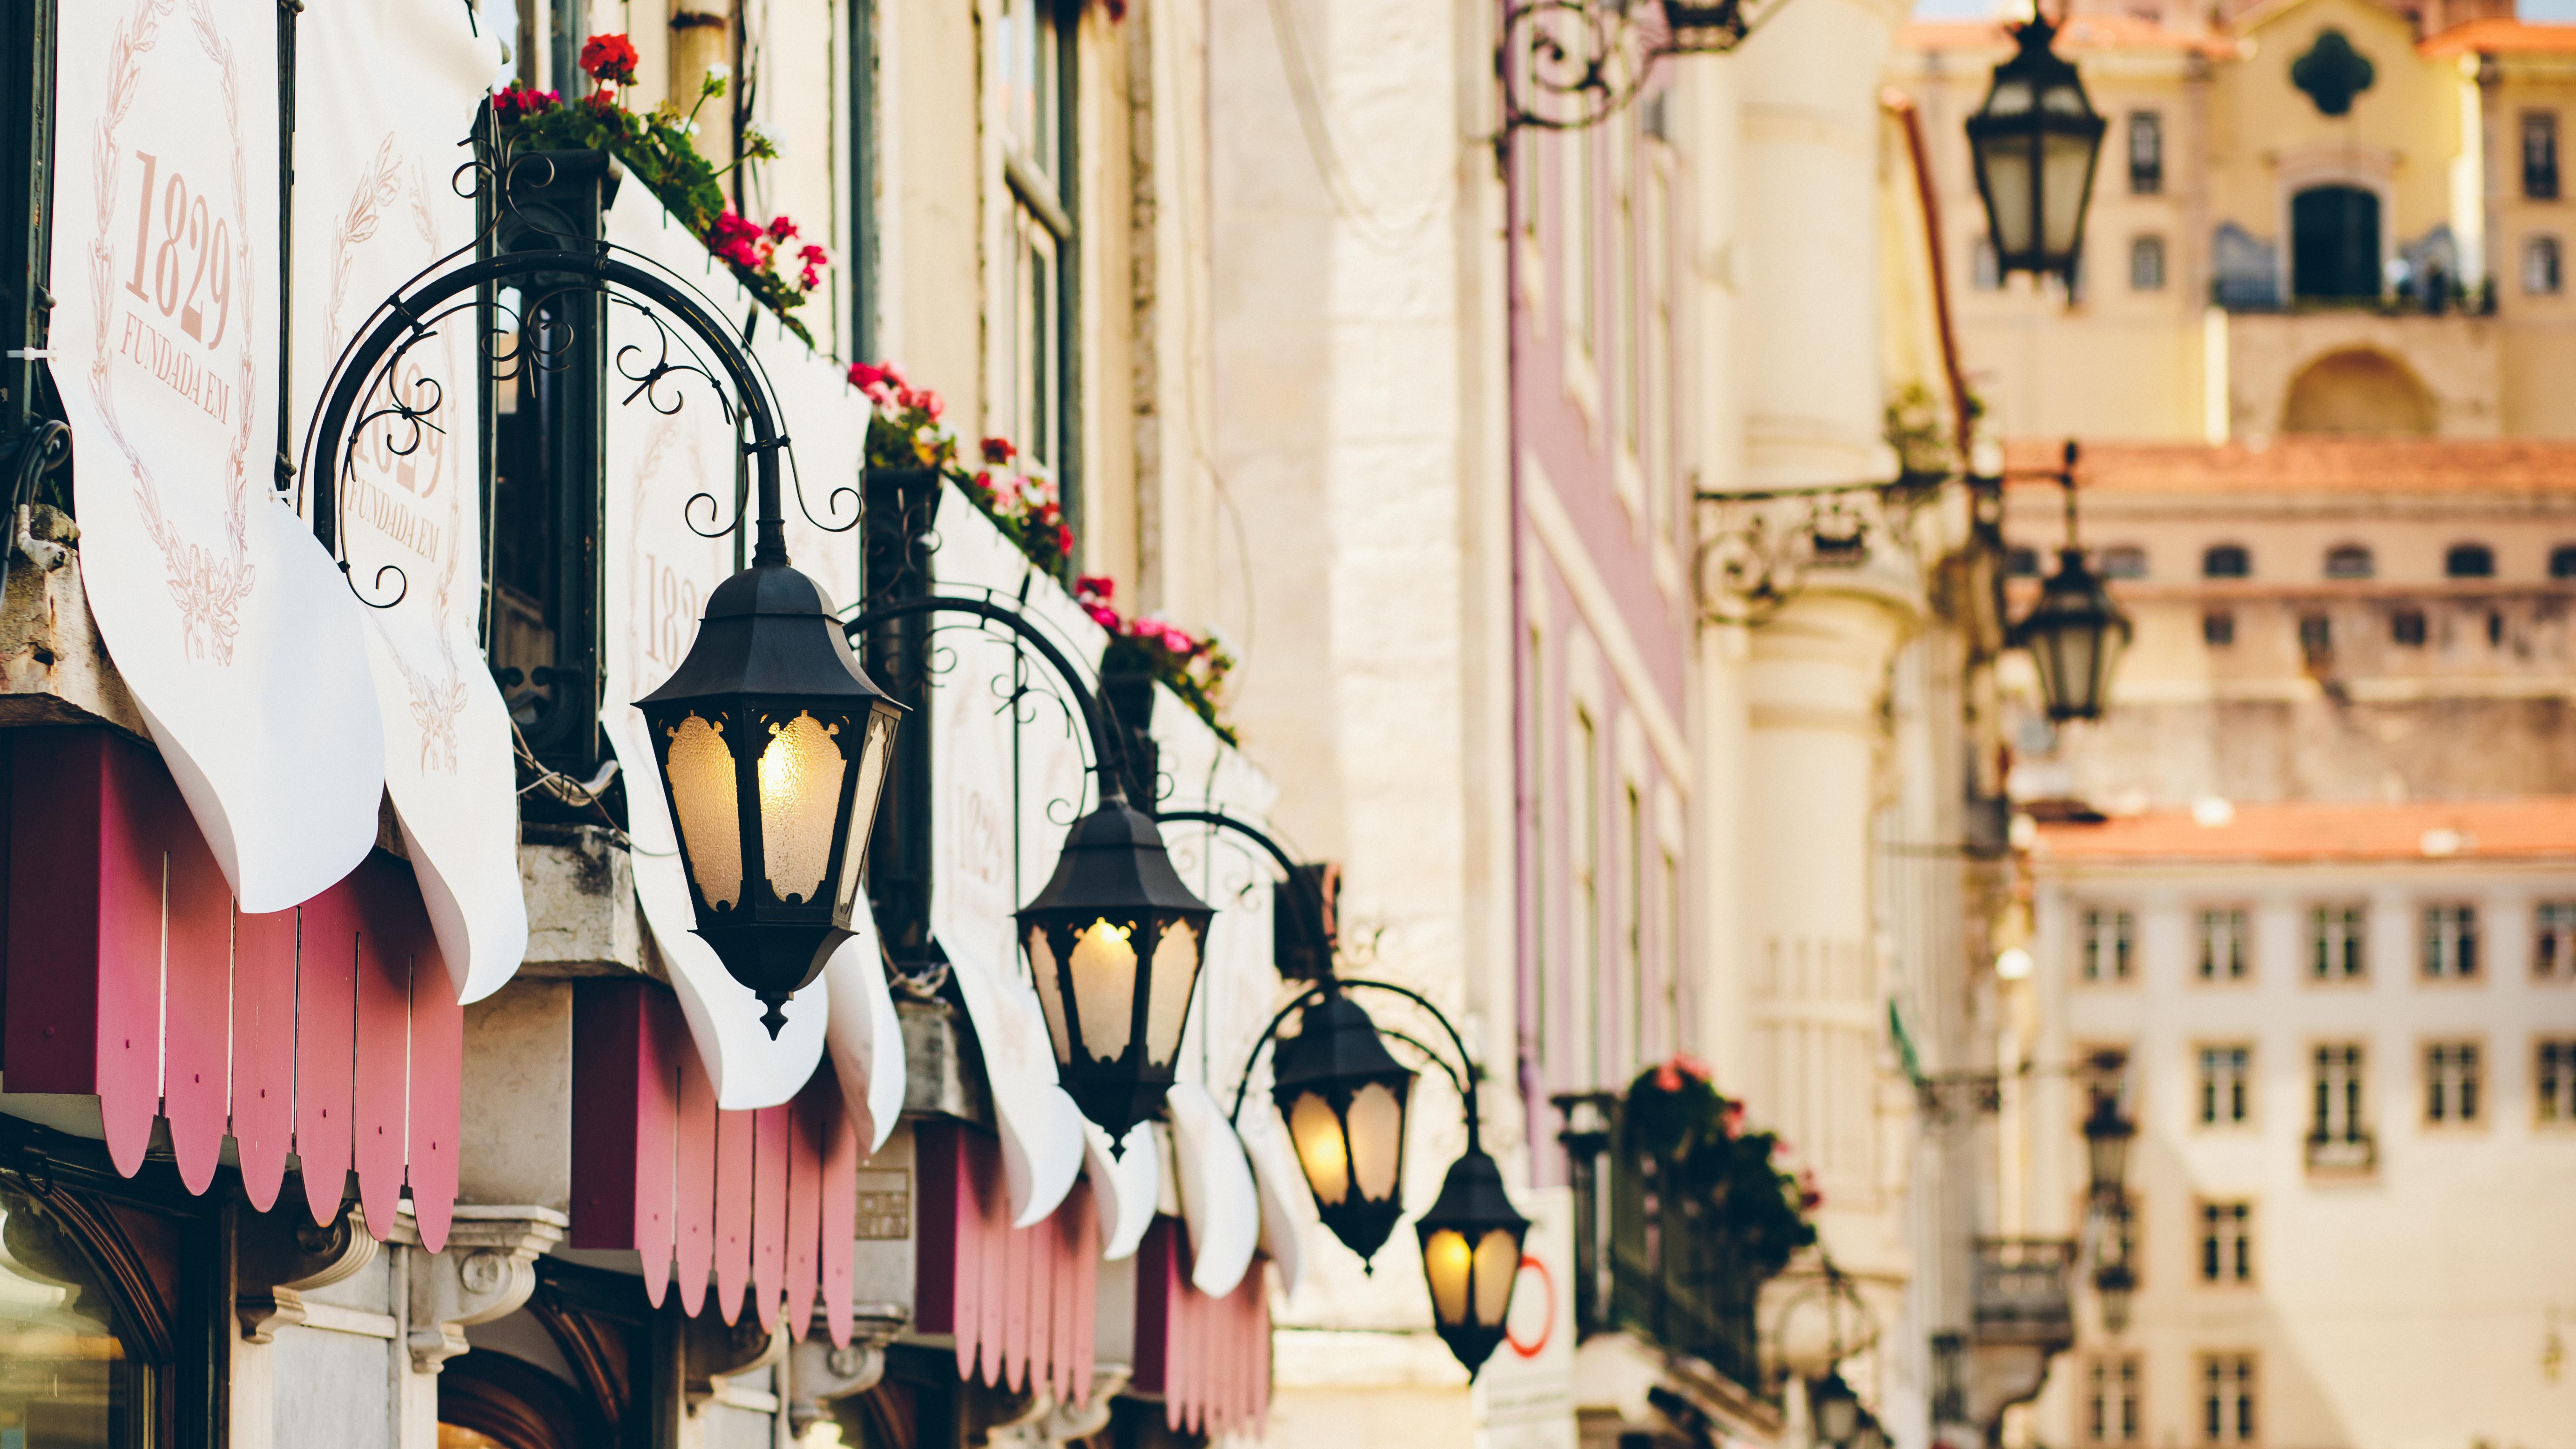 Contate Fotógrafo de Casamento Lisboa Portugal - Lucho Vargas - Cascais|Algarve